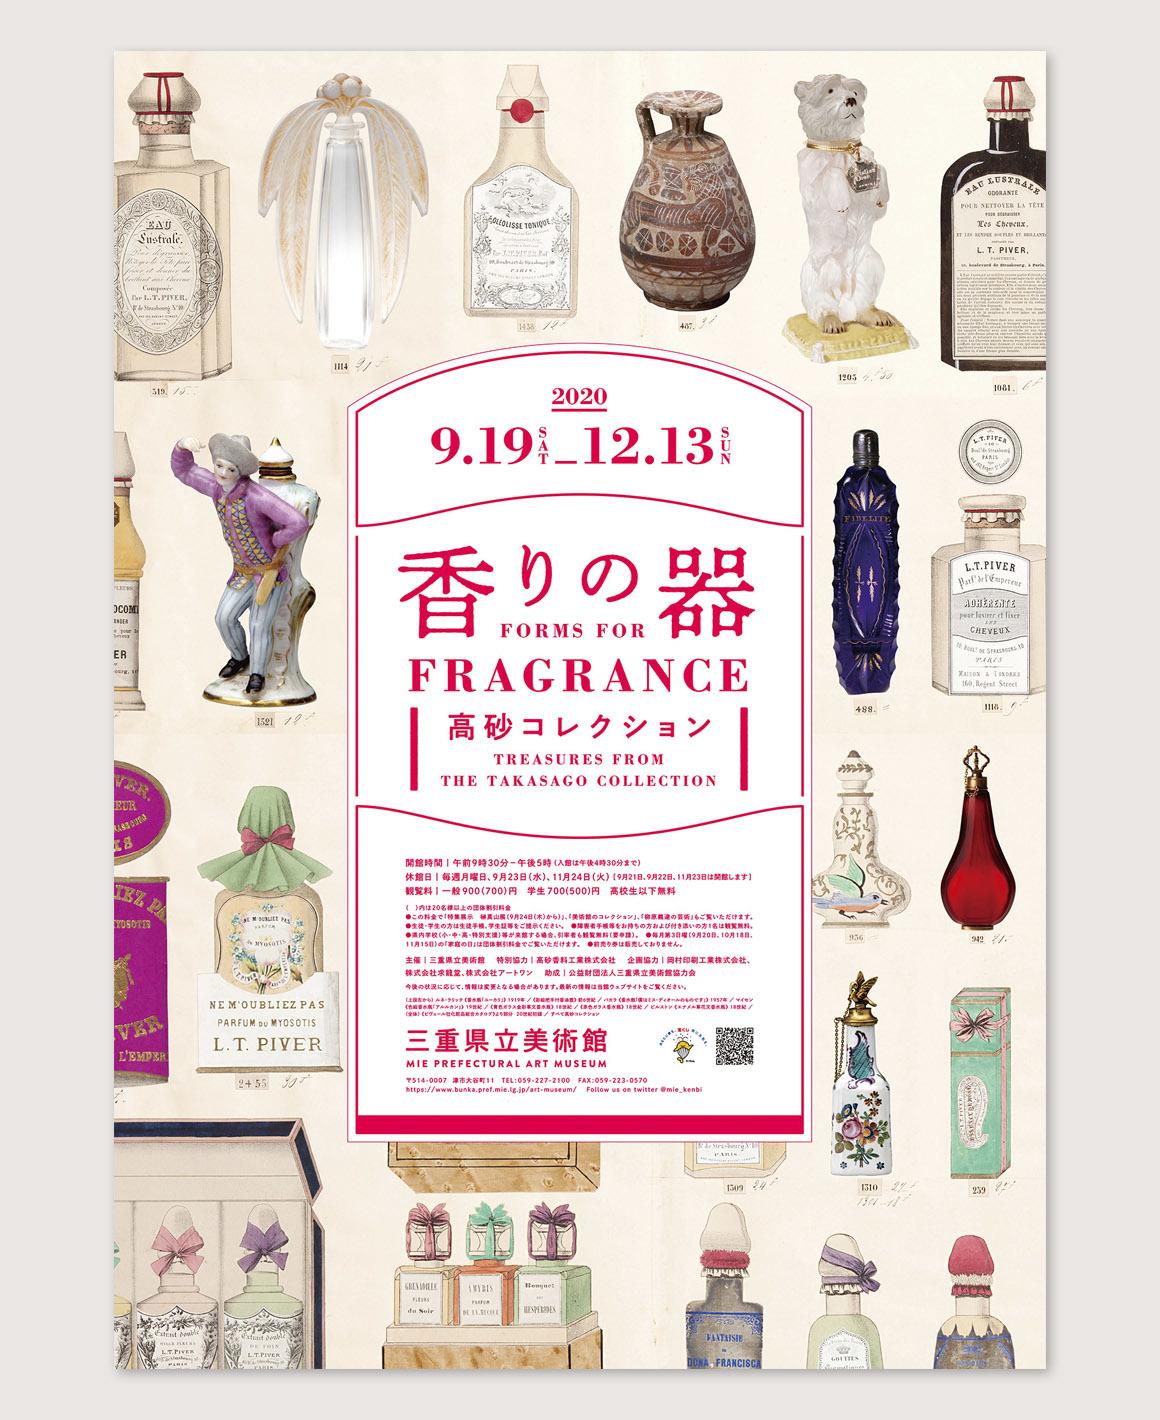 WORKS|香りの器―高砂コレクション_e0206124_12403353.jpg